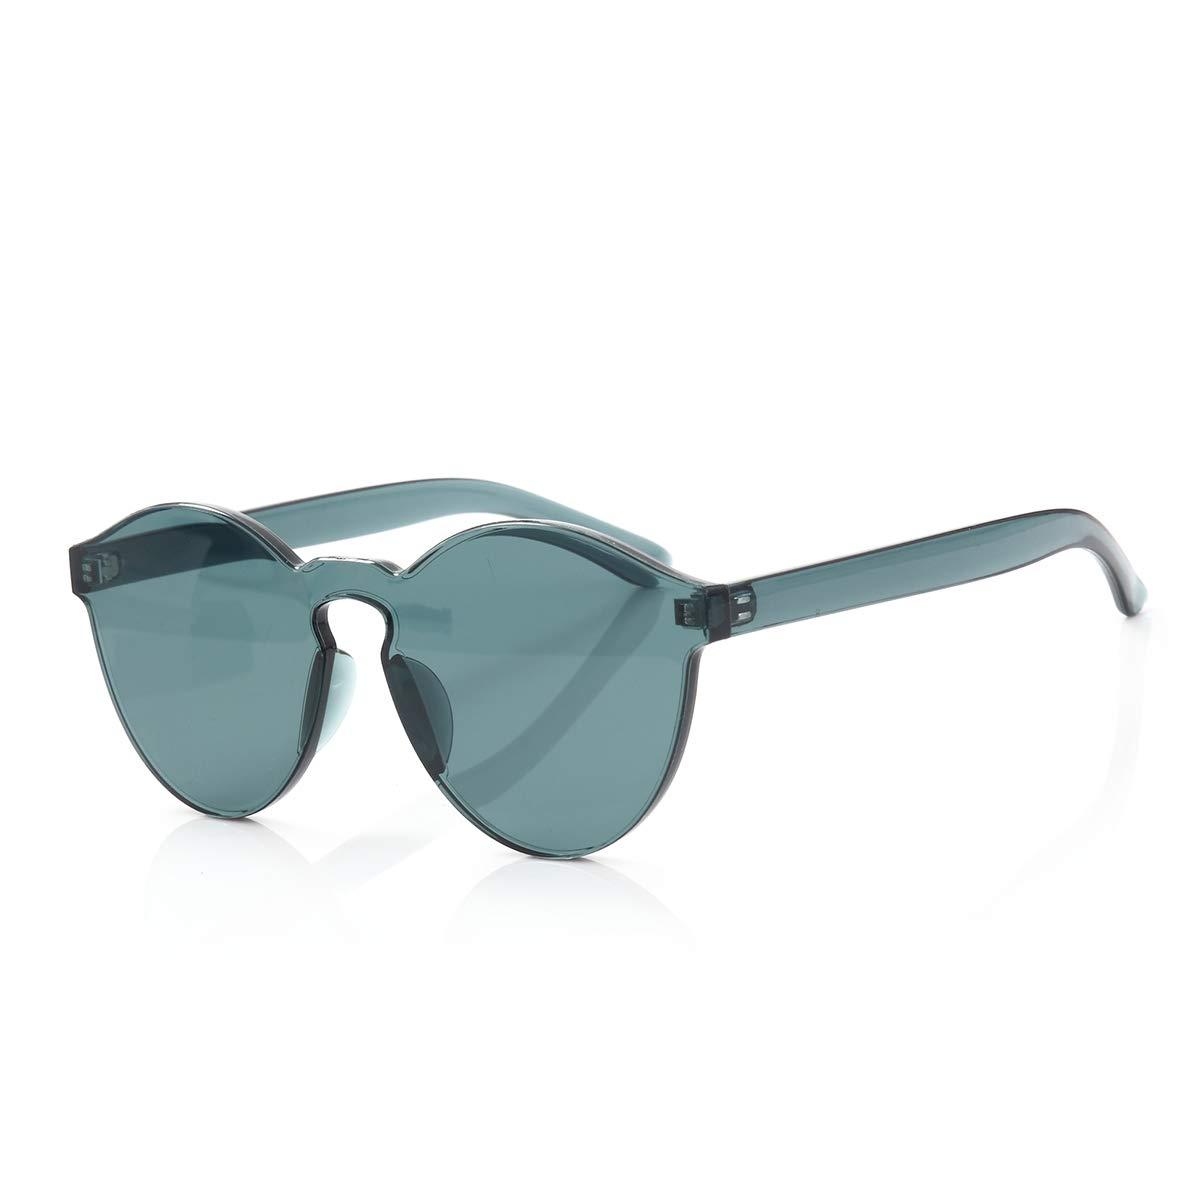 ee21fb8b529b Amazon.com  OLINOWL Rimless Sunglasses Oversized Colored Transparent Round  Eyewear Retro Eyeglasses for Women Men  Clothing